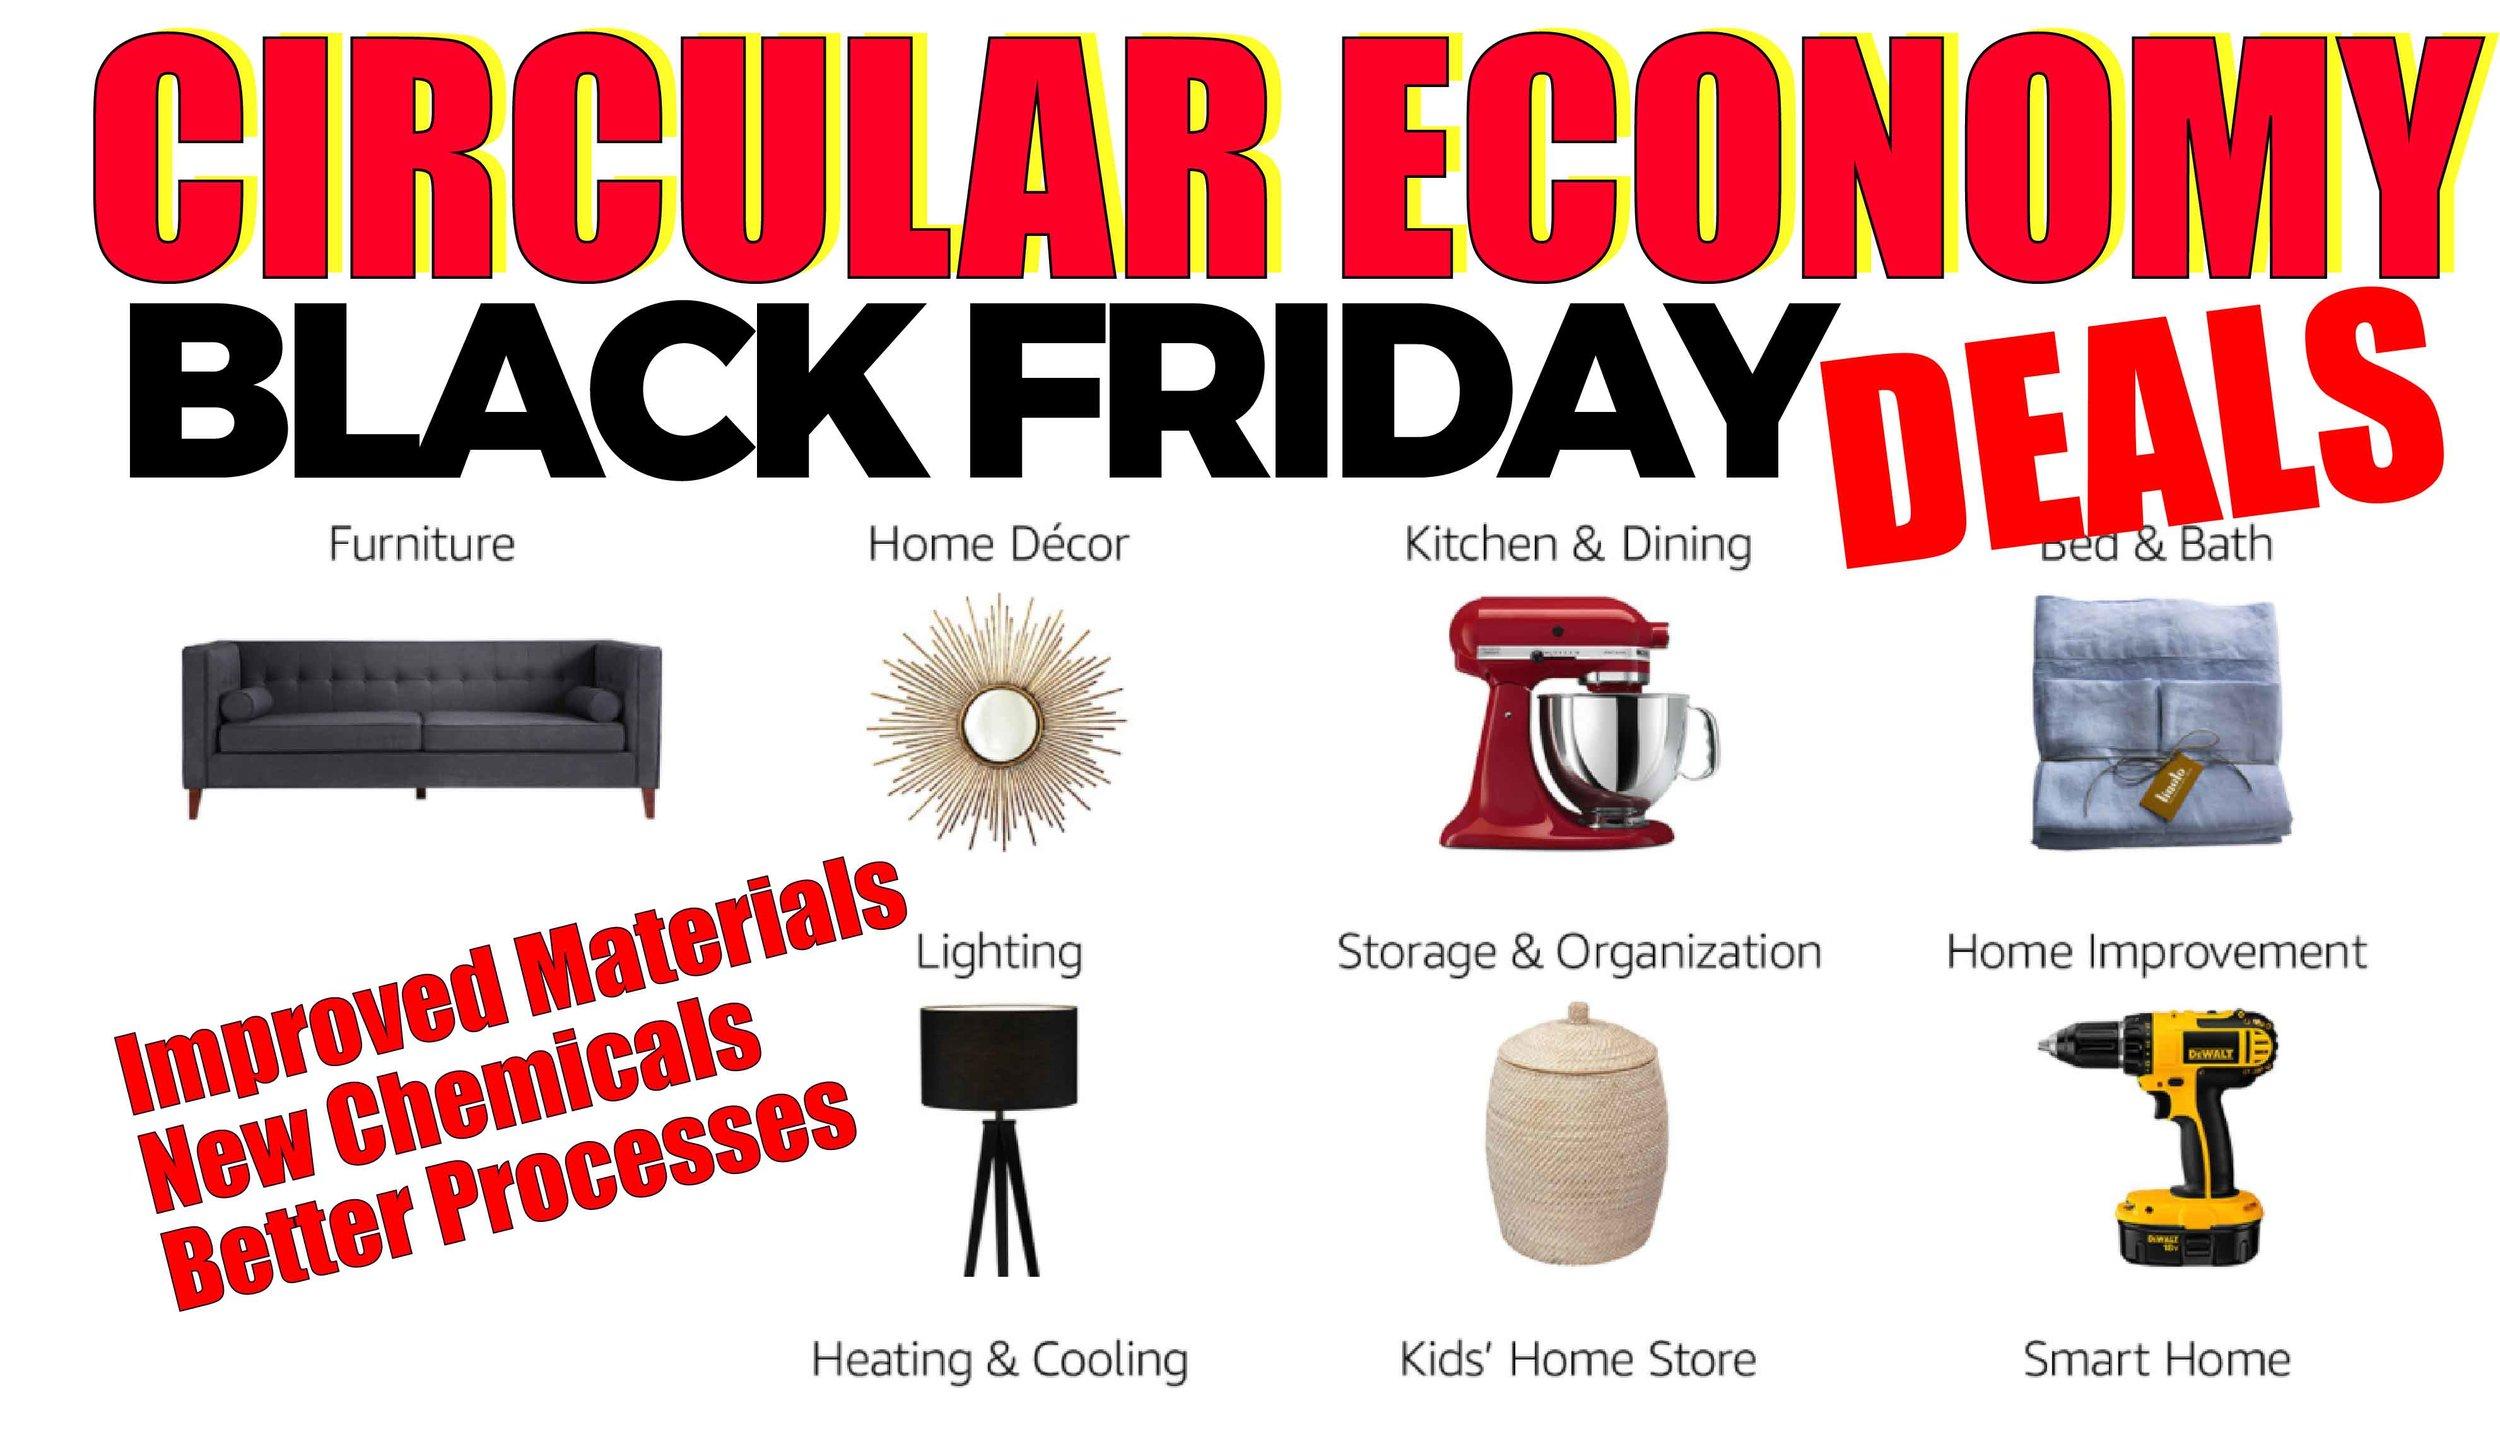 Ends Black Friday Circular Economy.jpg